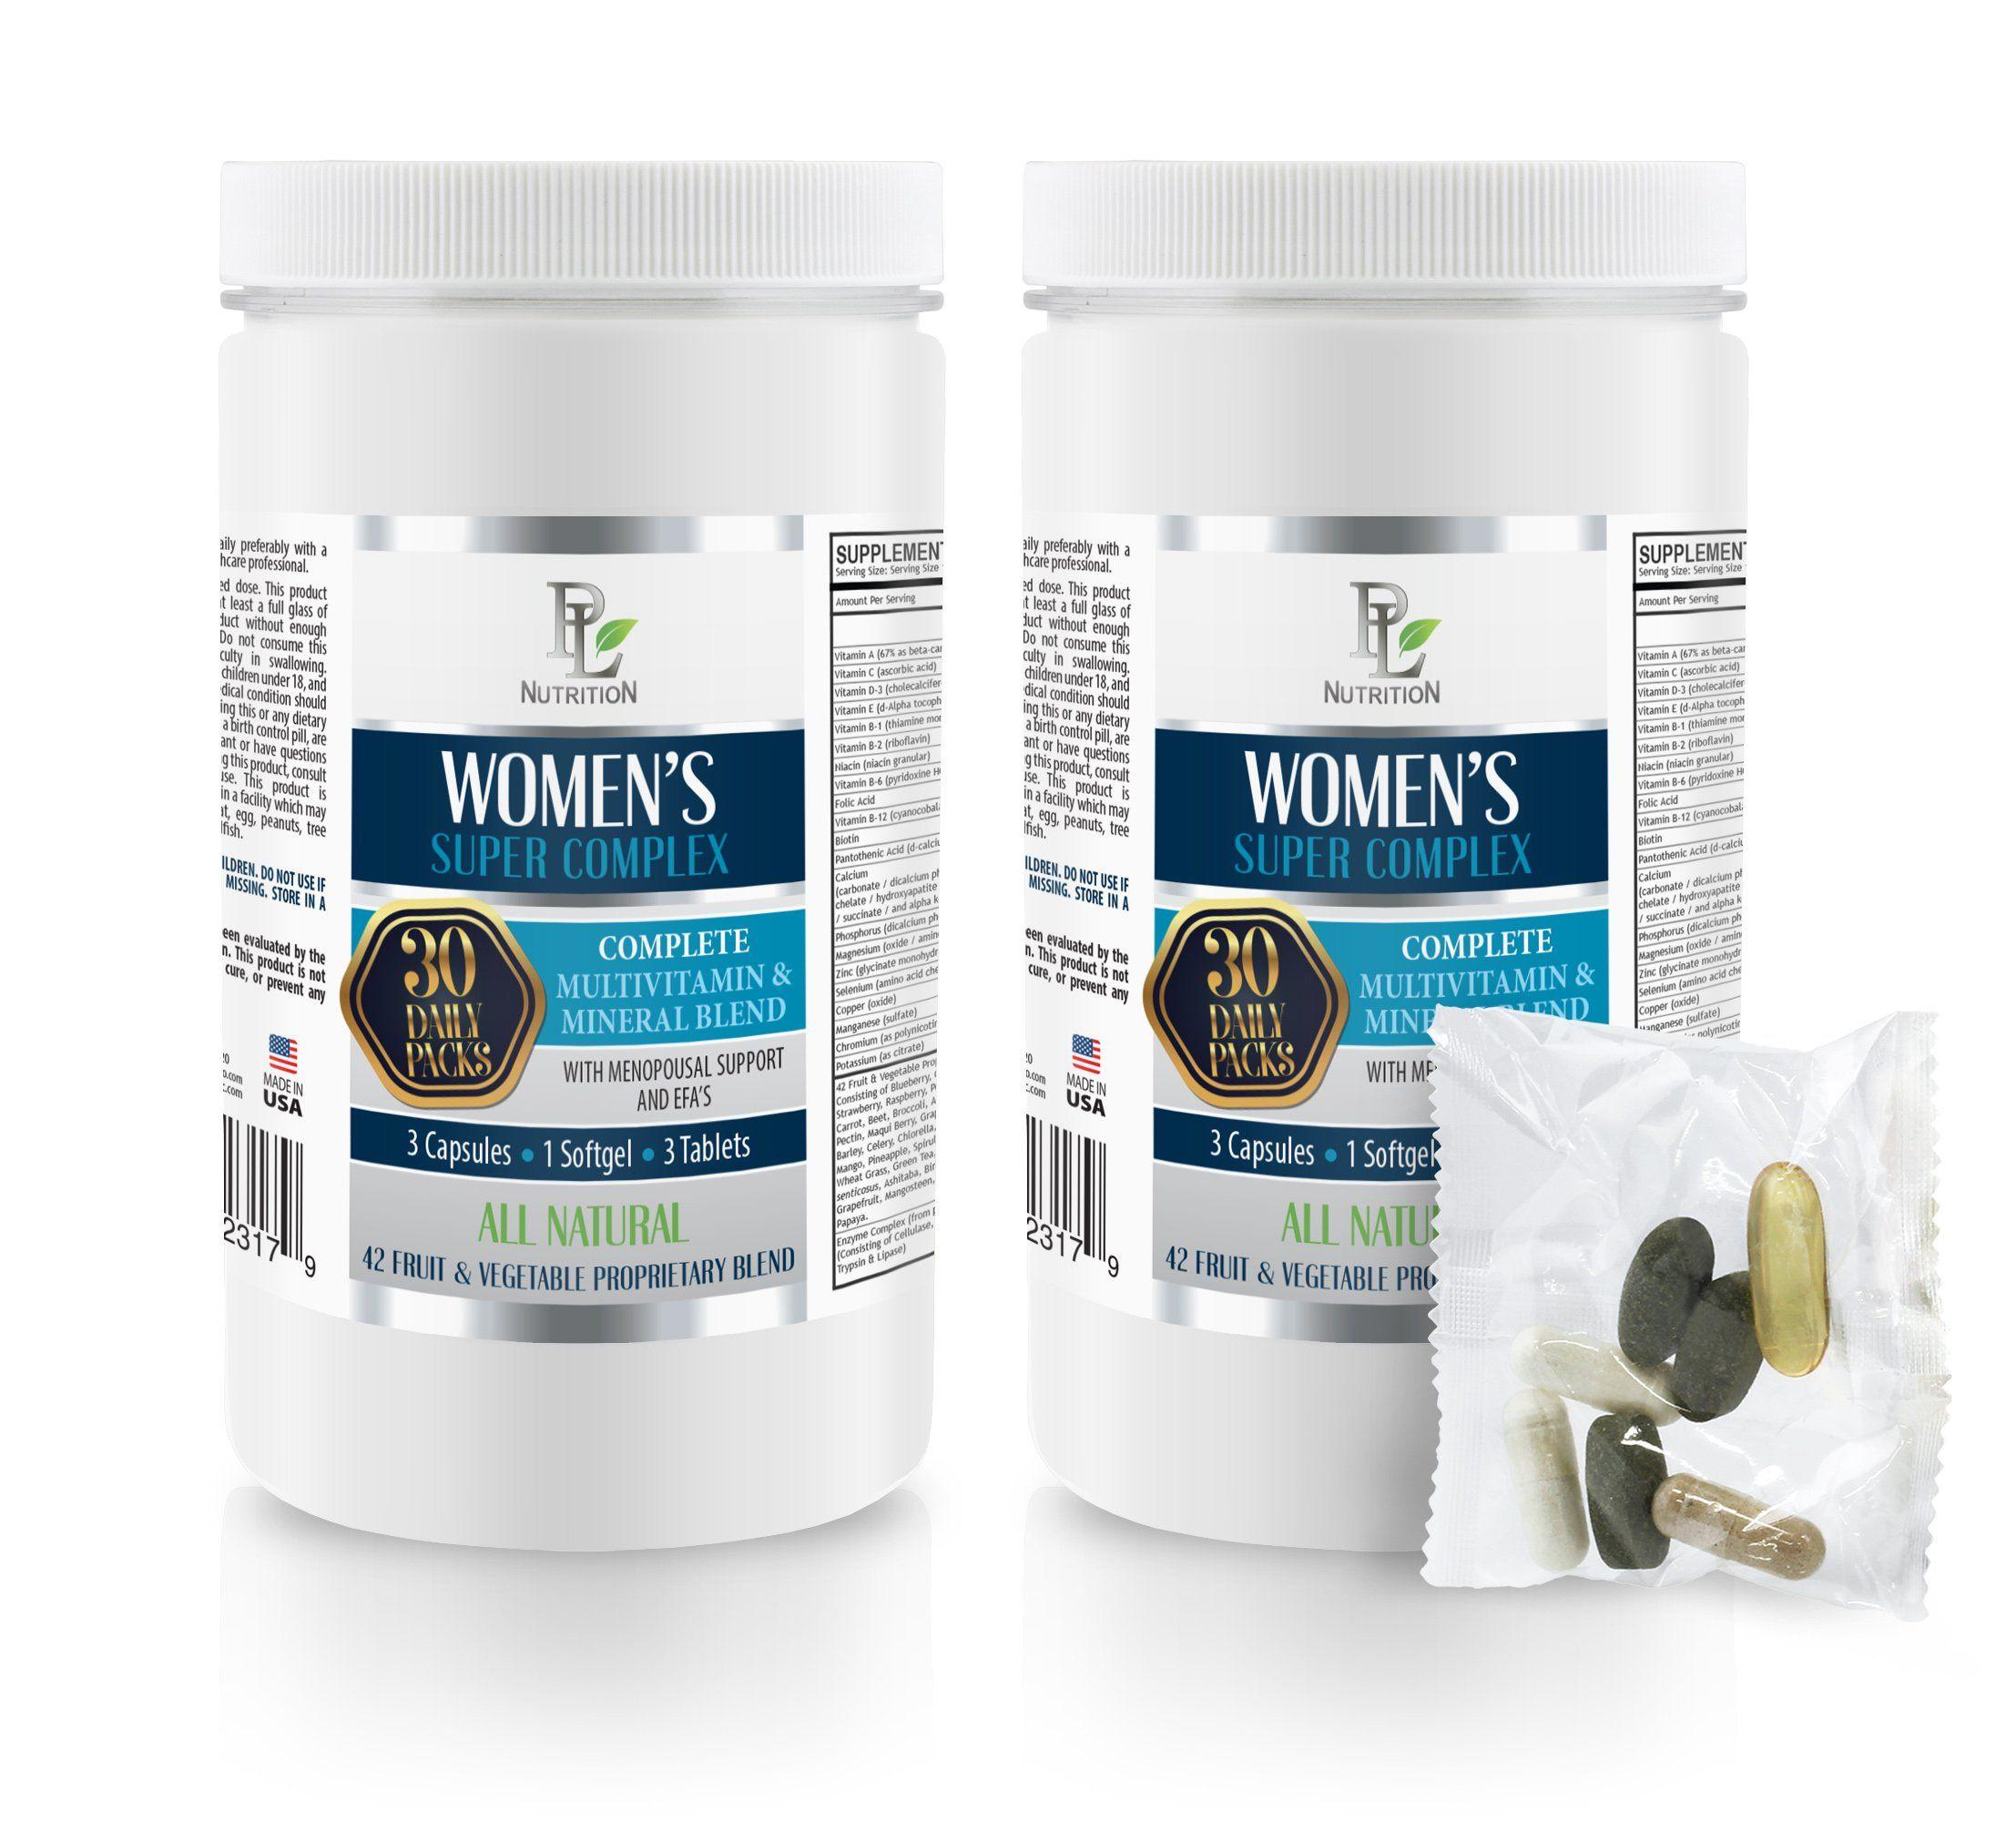 Fertitliy Diets Energy Boosting Supplements Womens Super Complex Daily Pack Paba Supplement Fertili Vitamins For Hair Growth Fertility Pills Fertility Tea